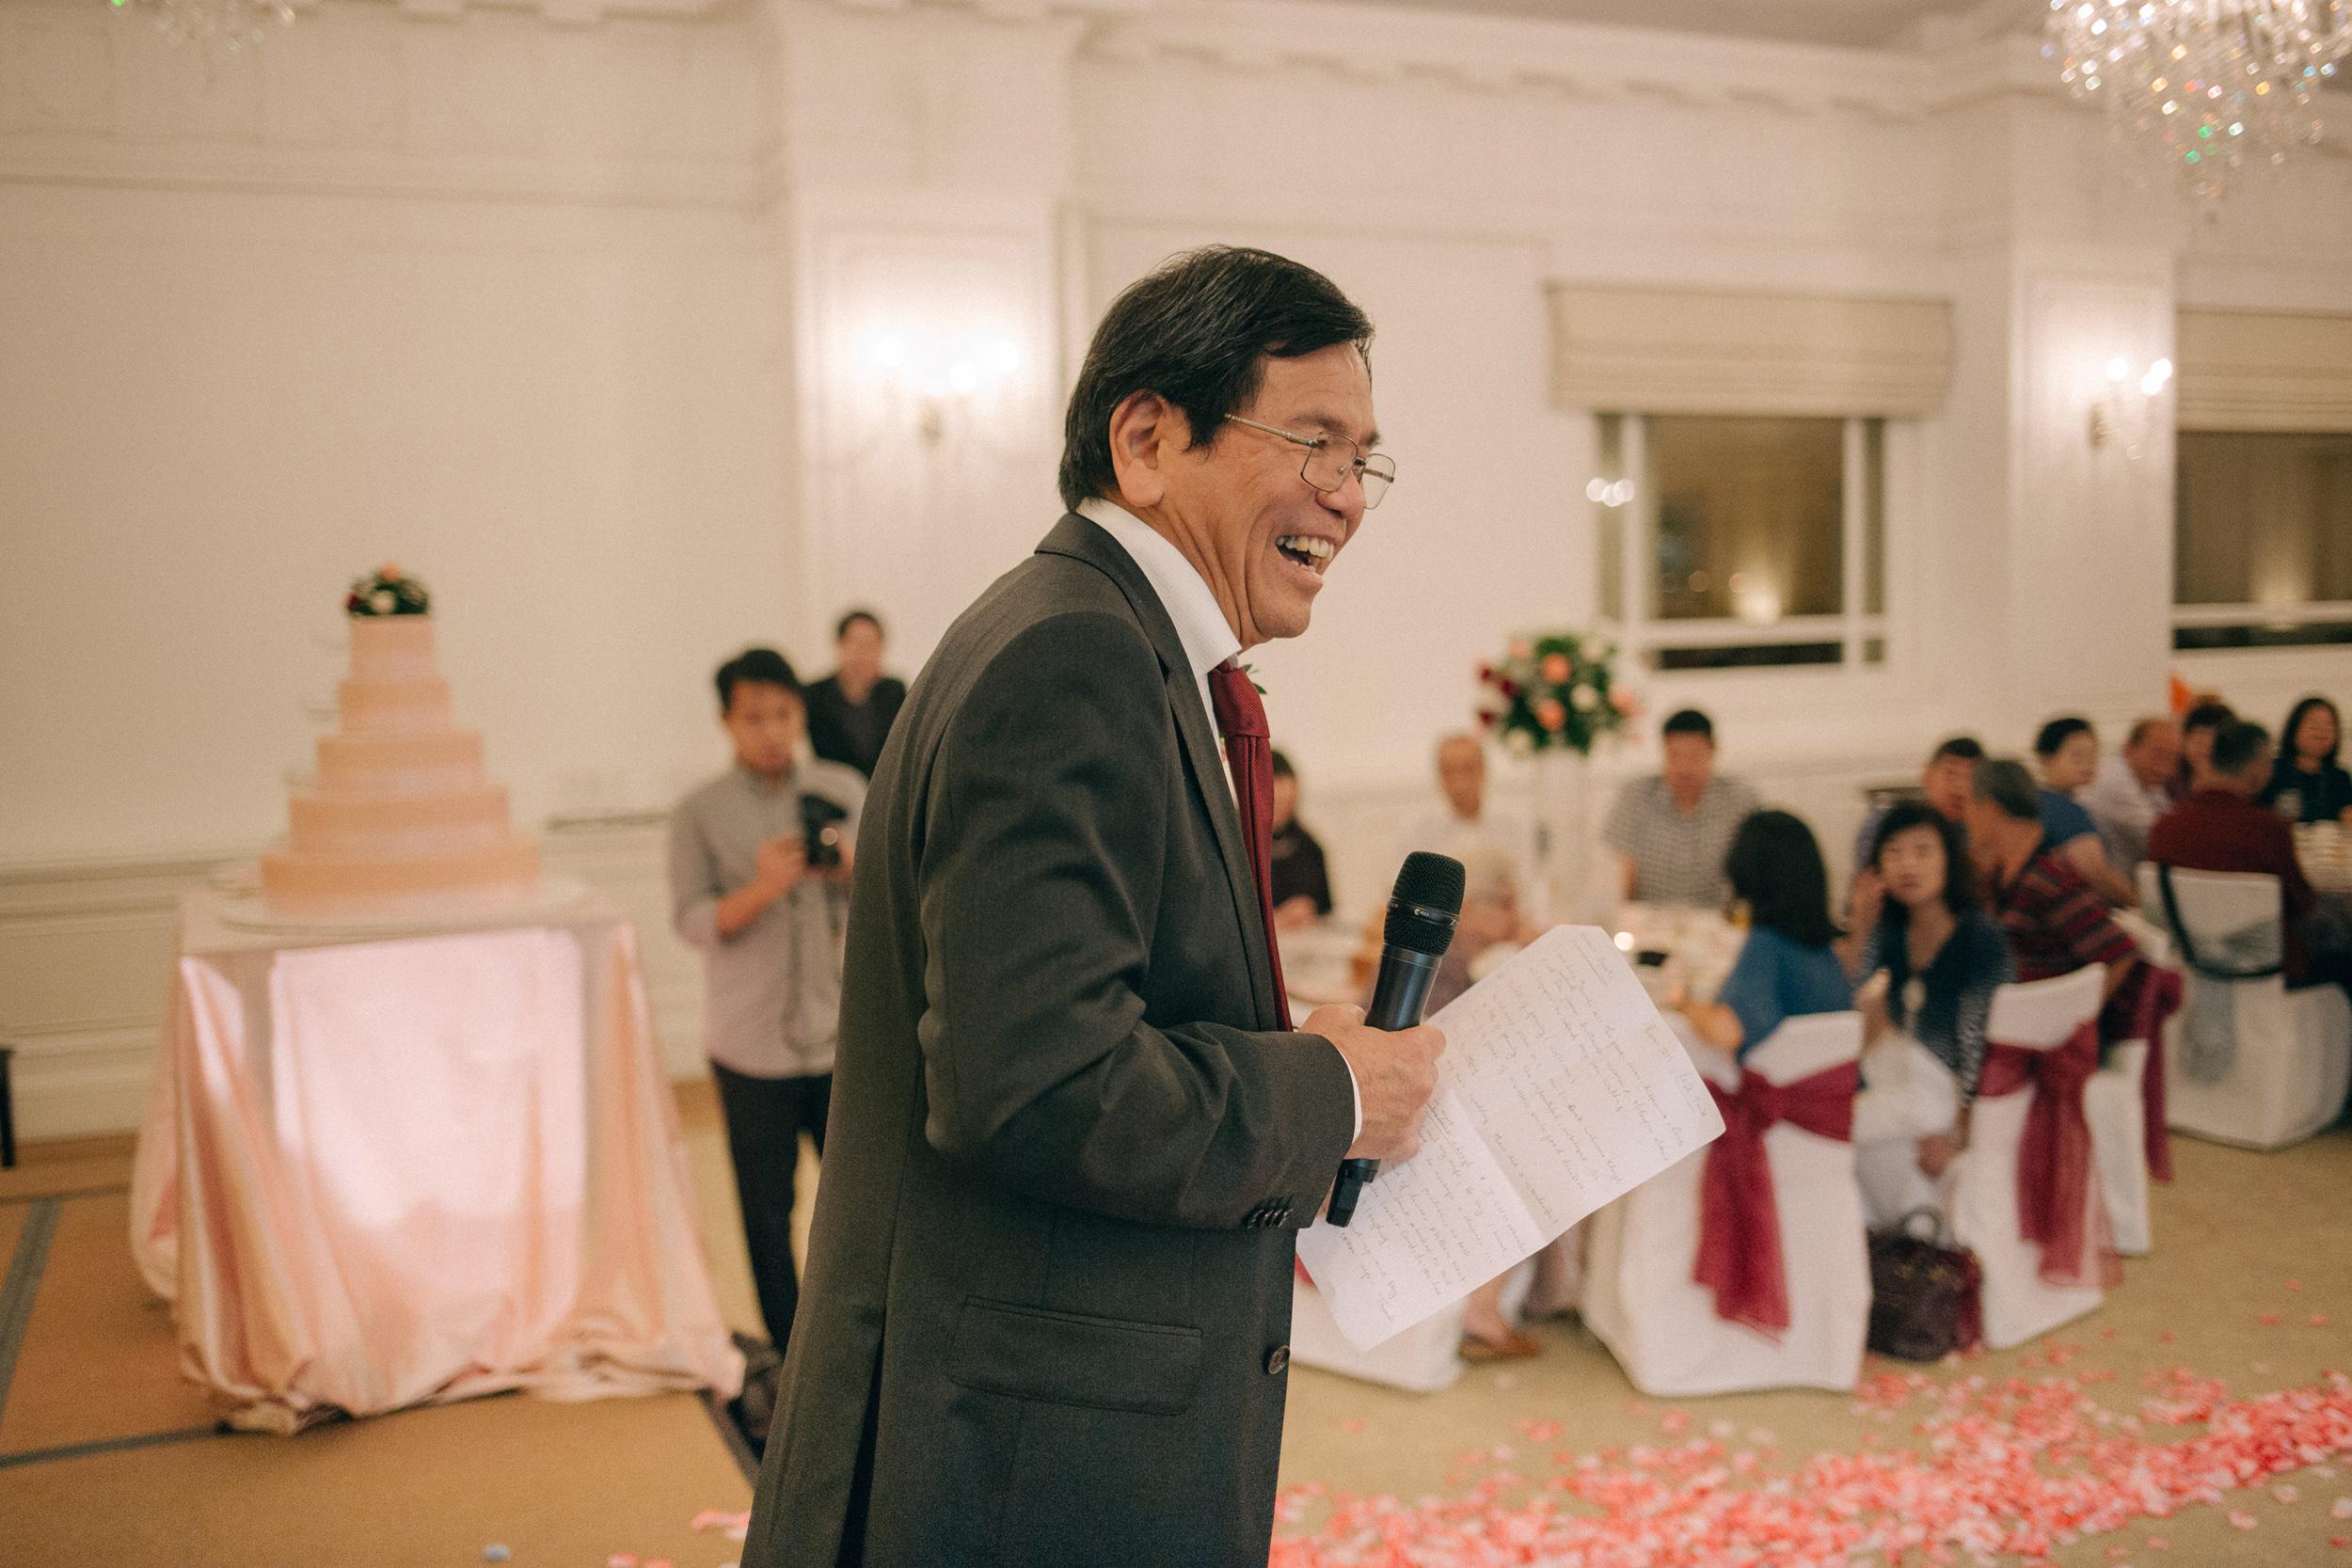 singapore-wedding-photographer-cheryl-matthew-fullerton-hotel-wedding-63.jpg